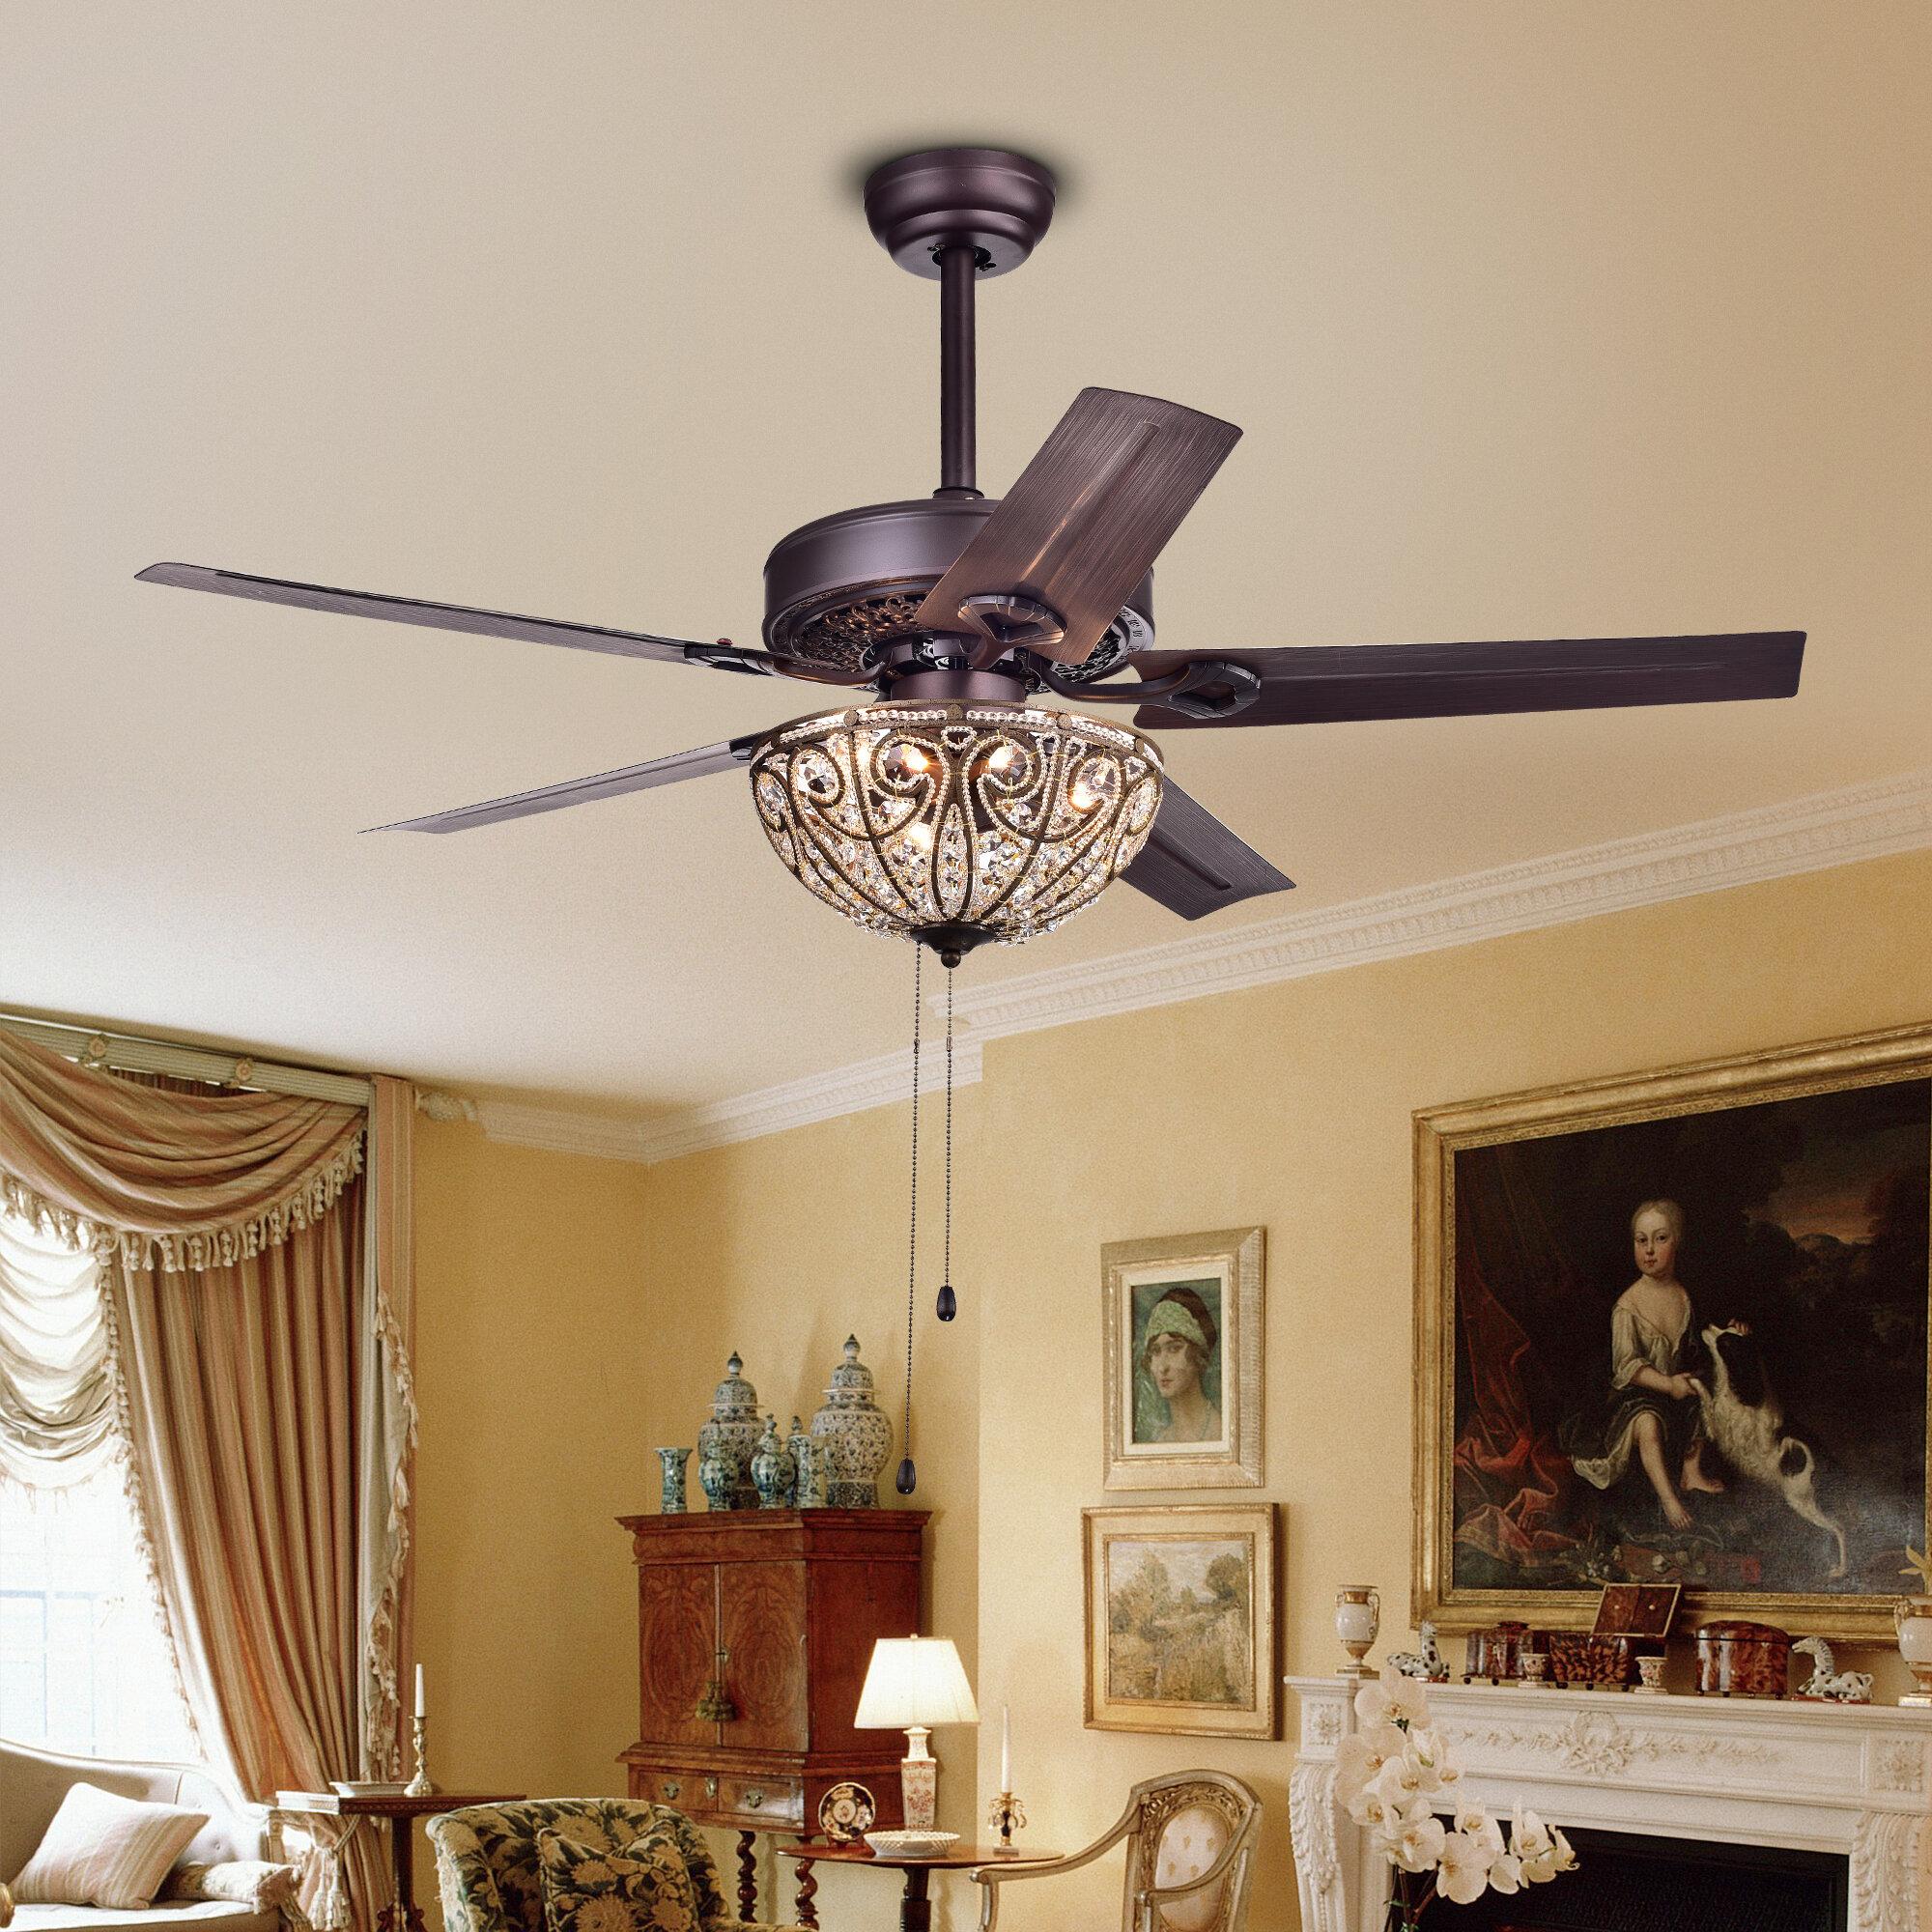 Astoria Grand Aspen 5 Blade Crystal Light Ceiling Fan & Reviews